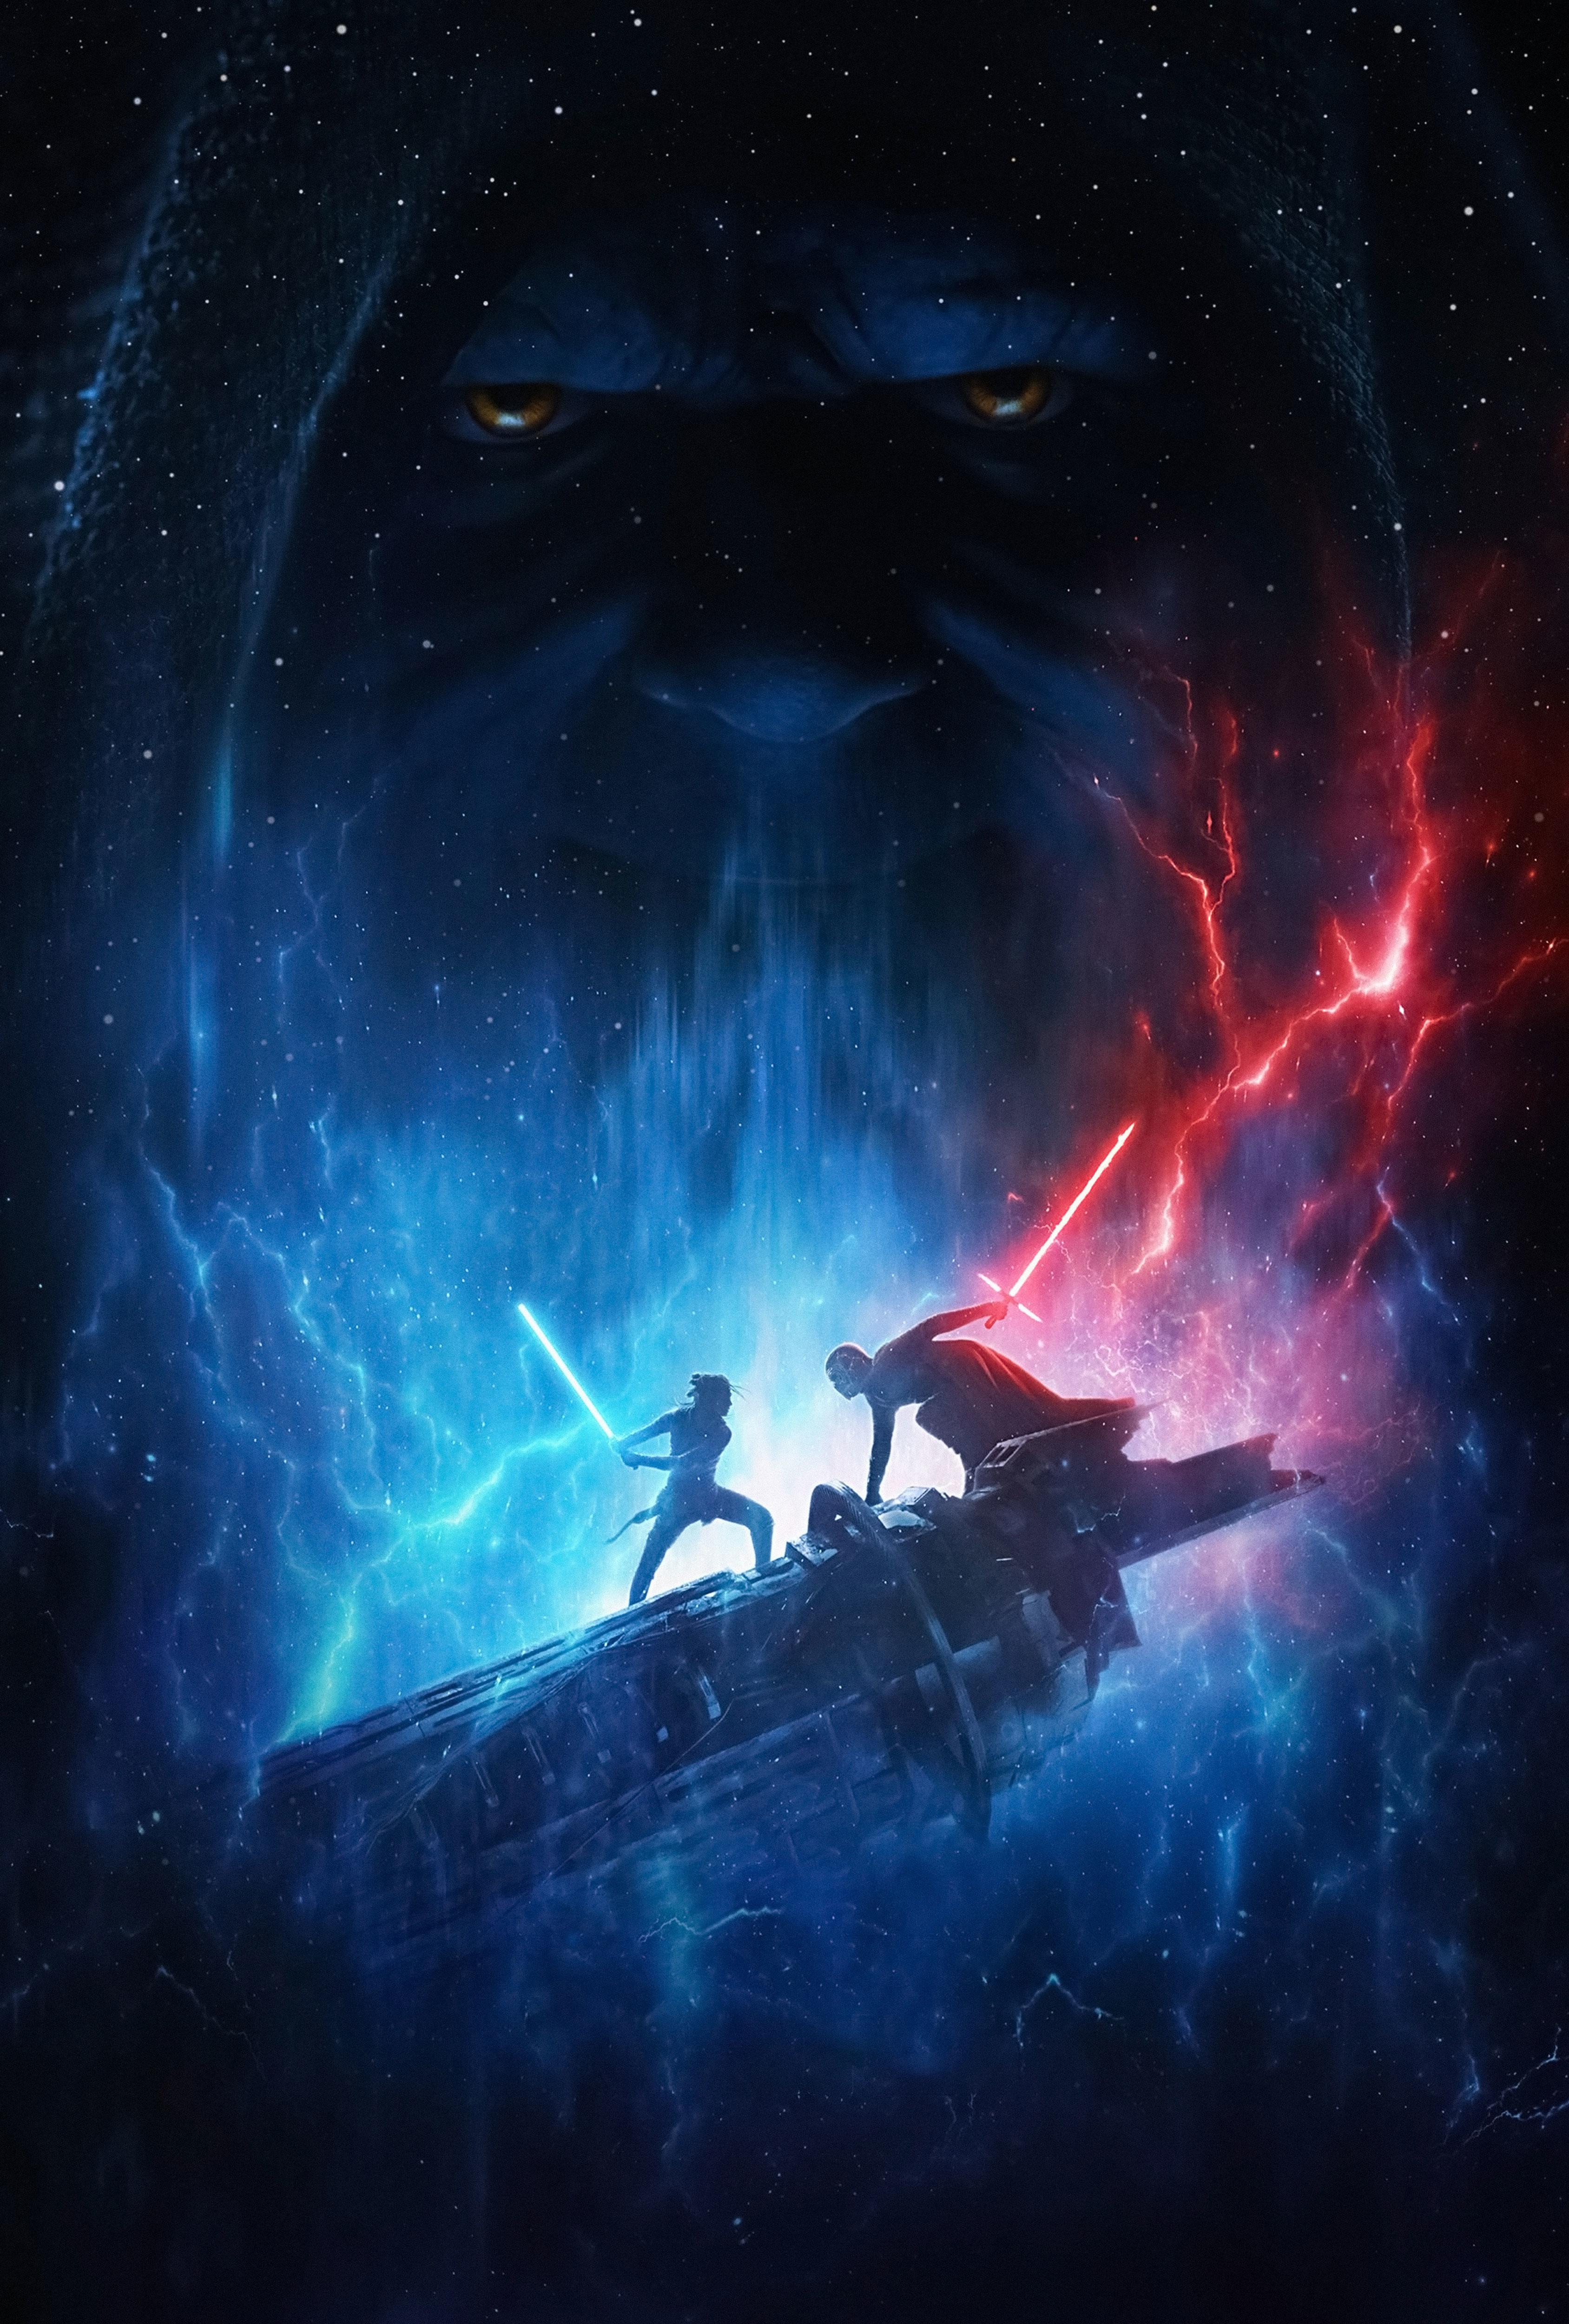 Star Wars Mobile Wallpapers Wallpaper Cave